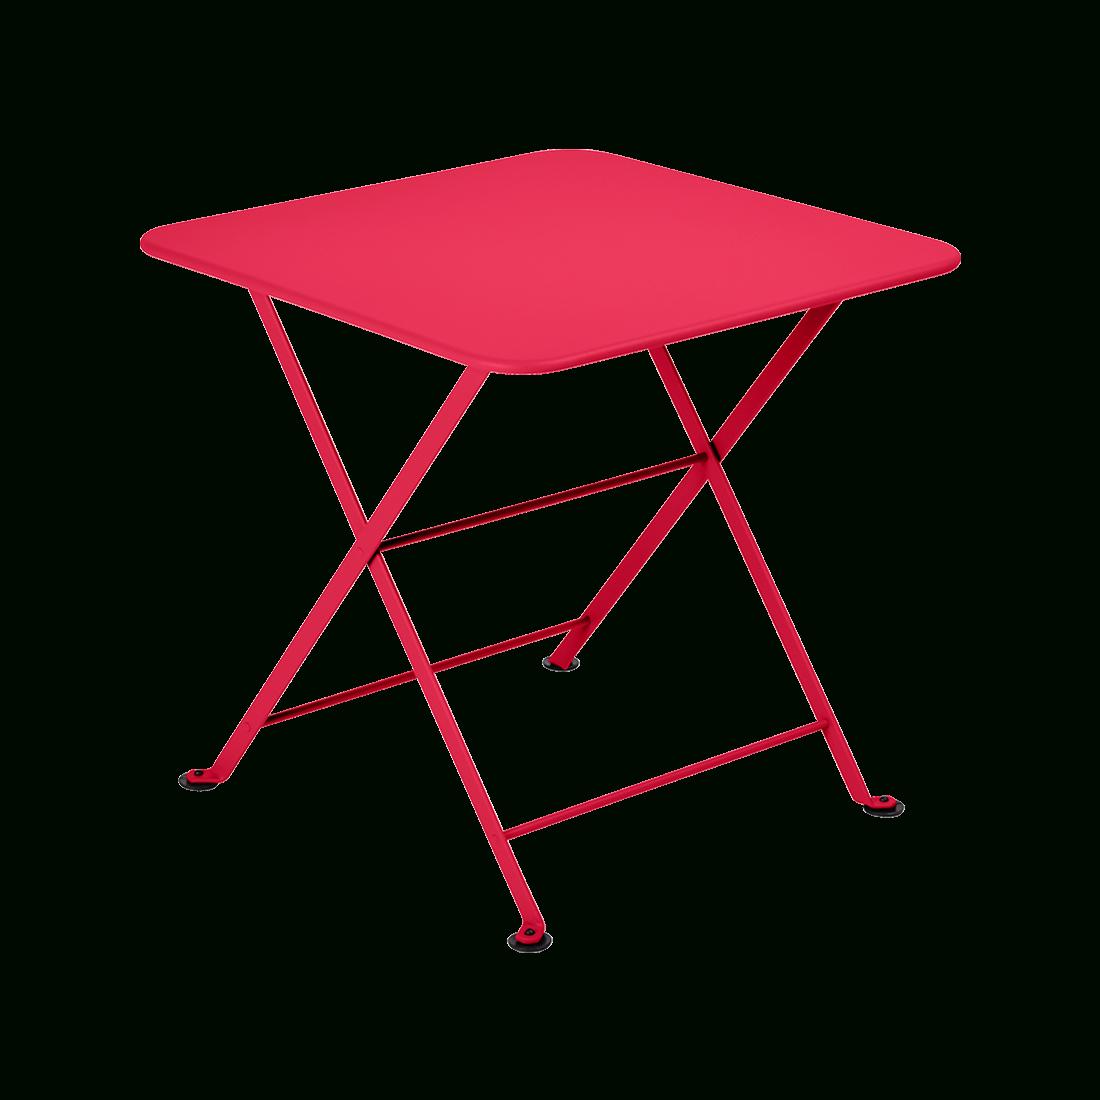 Tom Pouce Square Table, Metal Table For Child dedans Table Jardin Rose